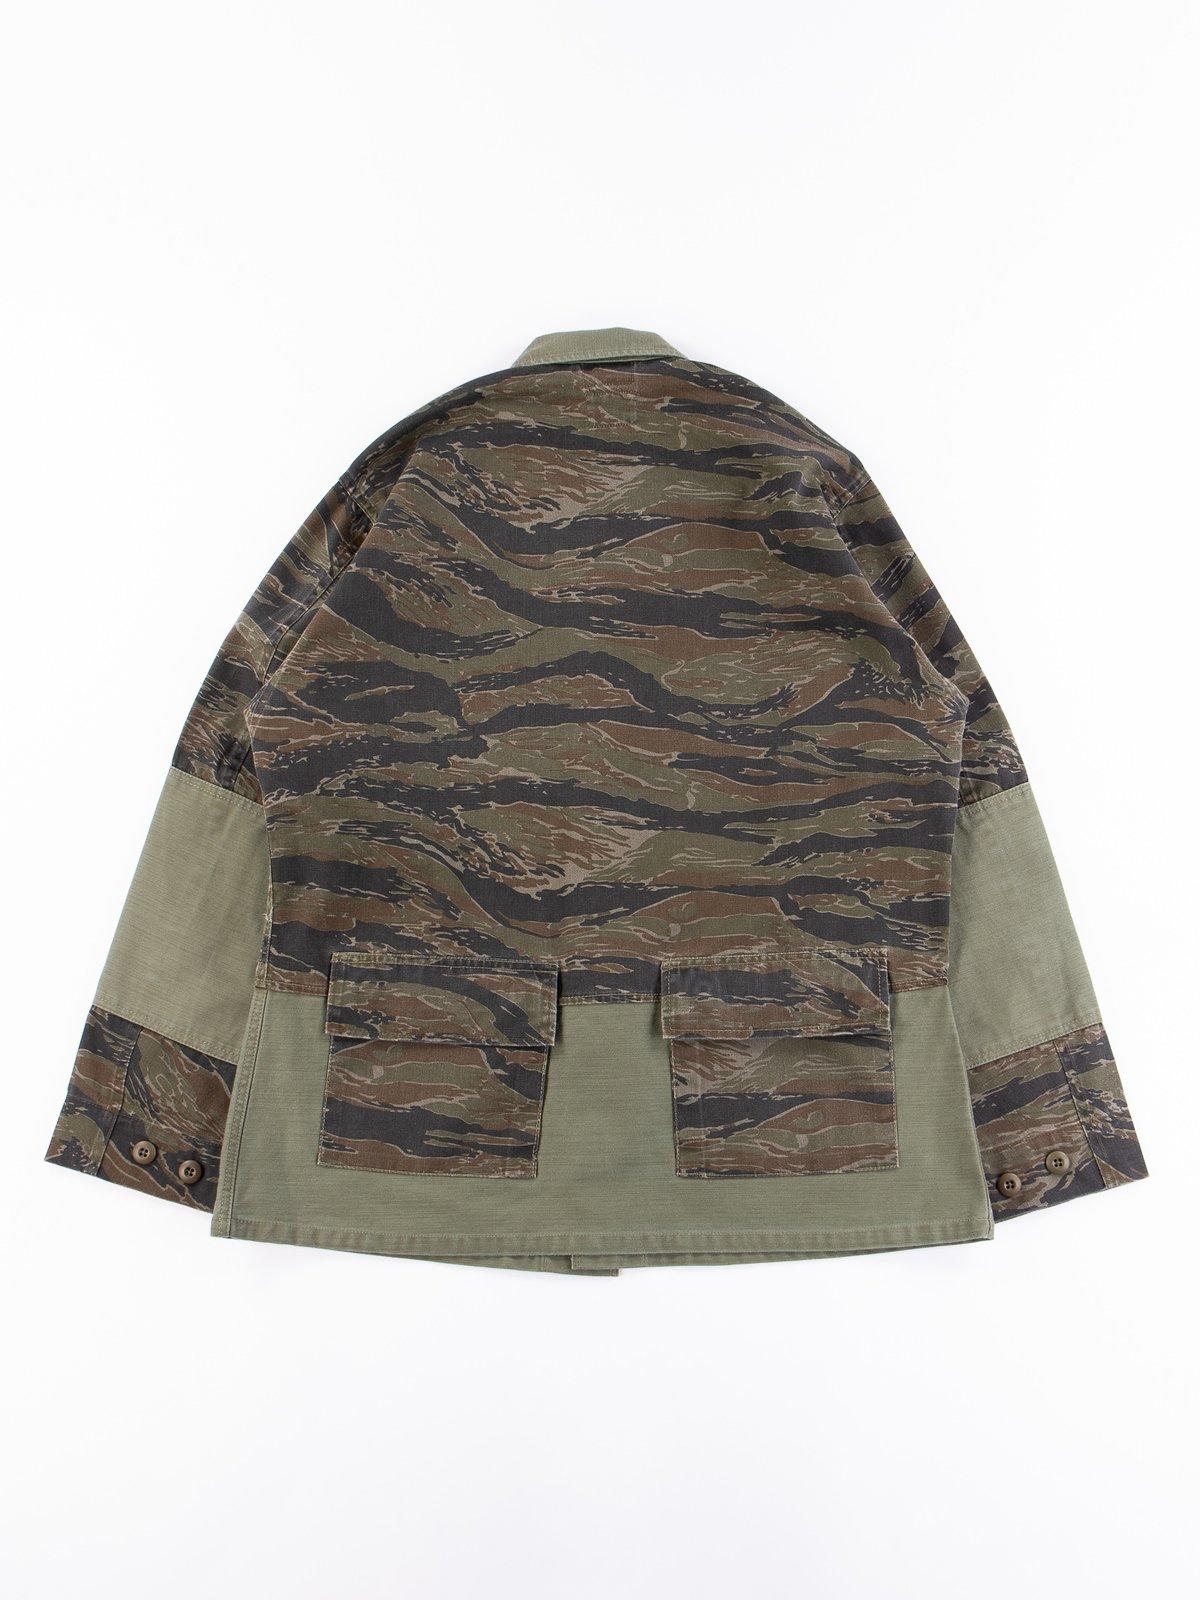 Reworks Camo/Olive Field Jacket - Image 6